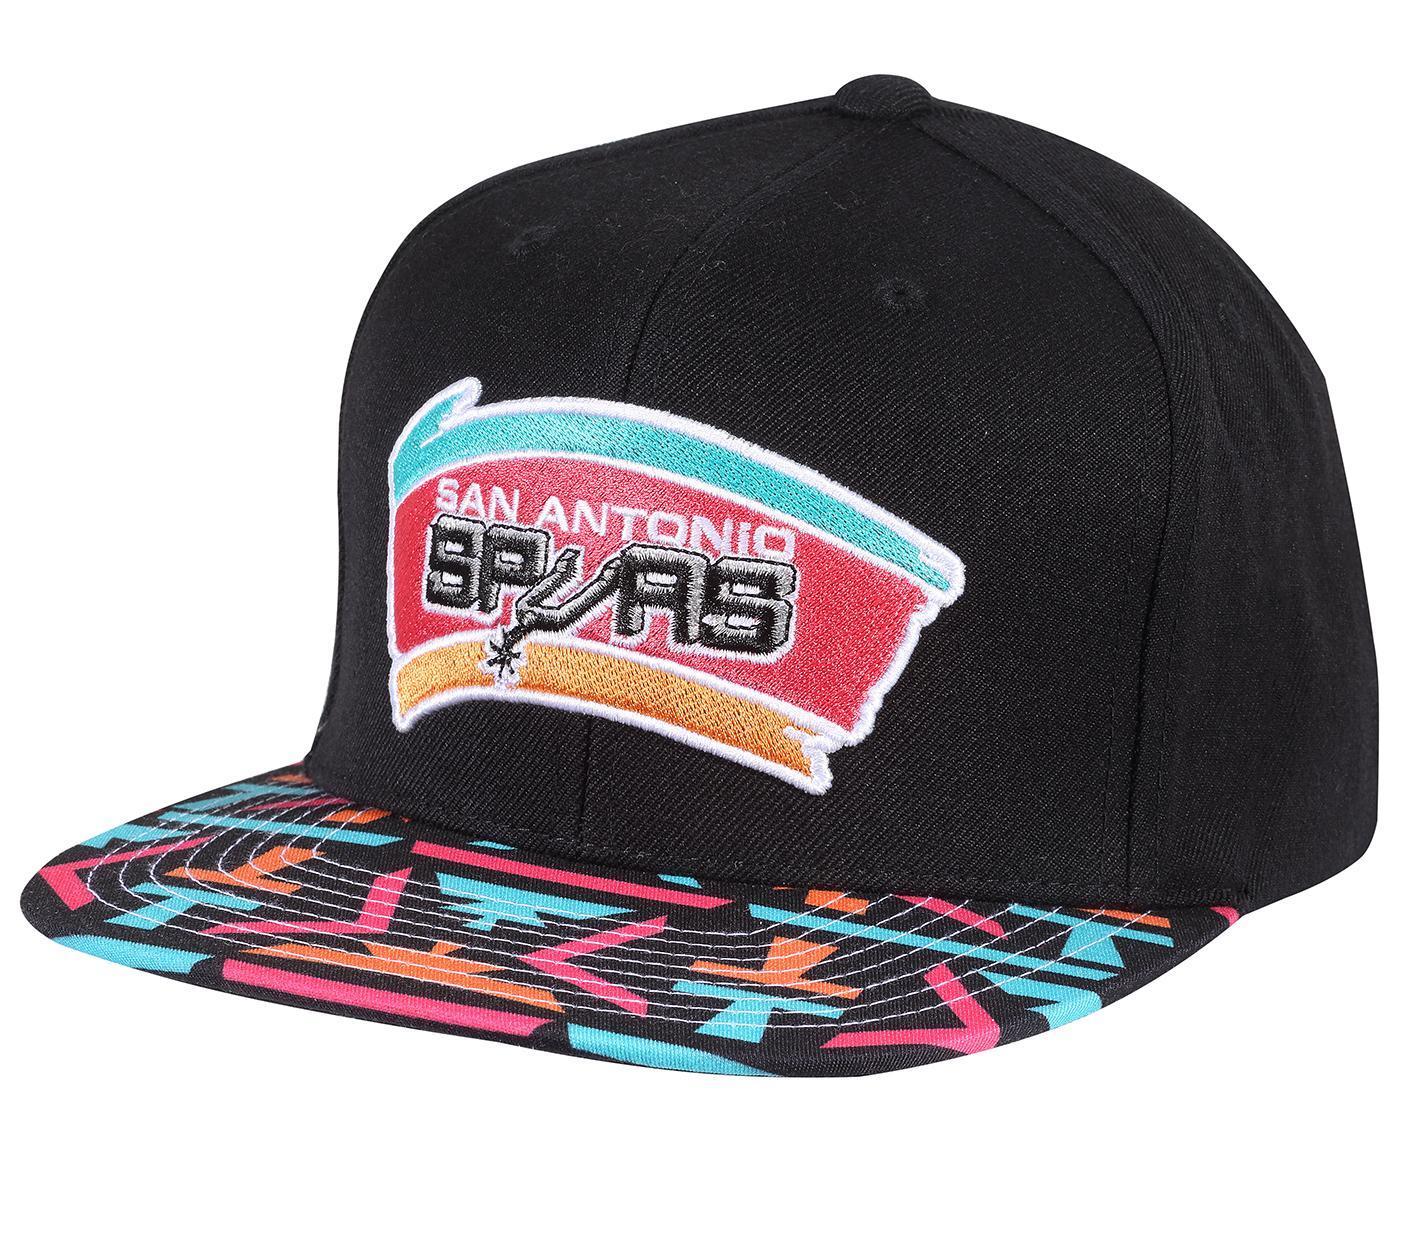 premium selection 6daa0 34035 Team DNA Snapback San Antonio Spurs